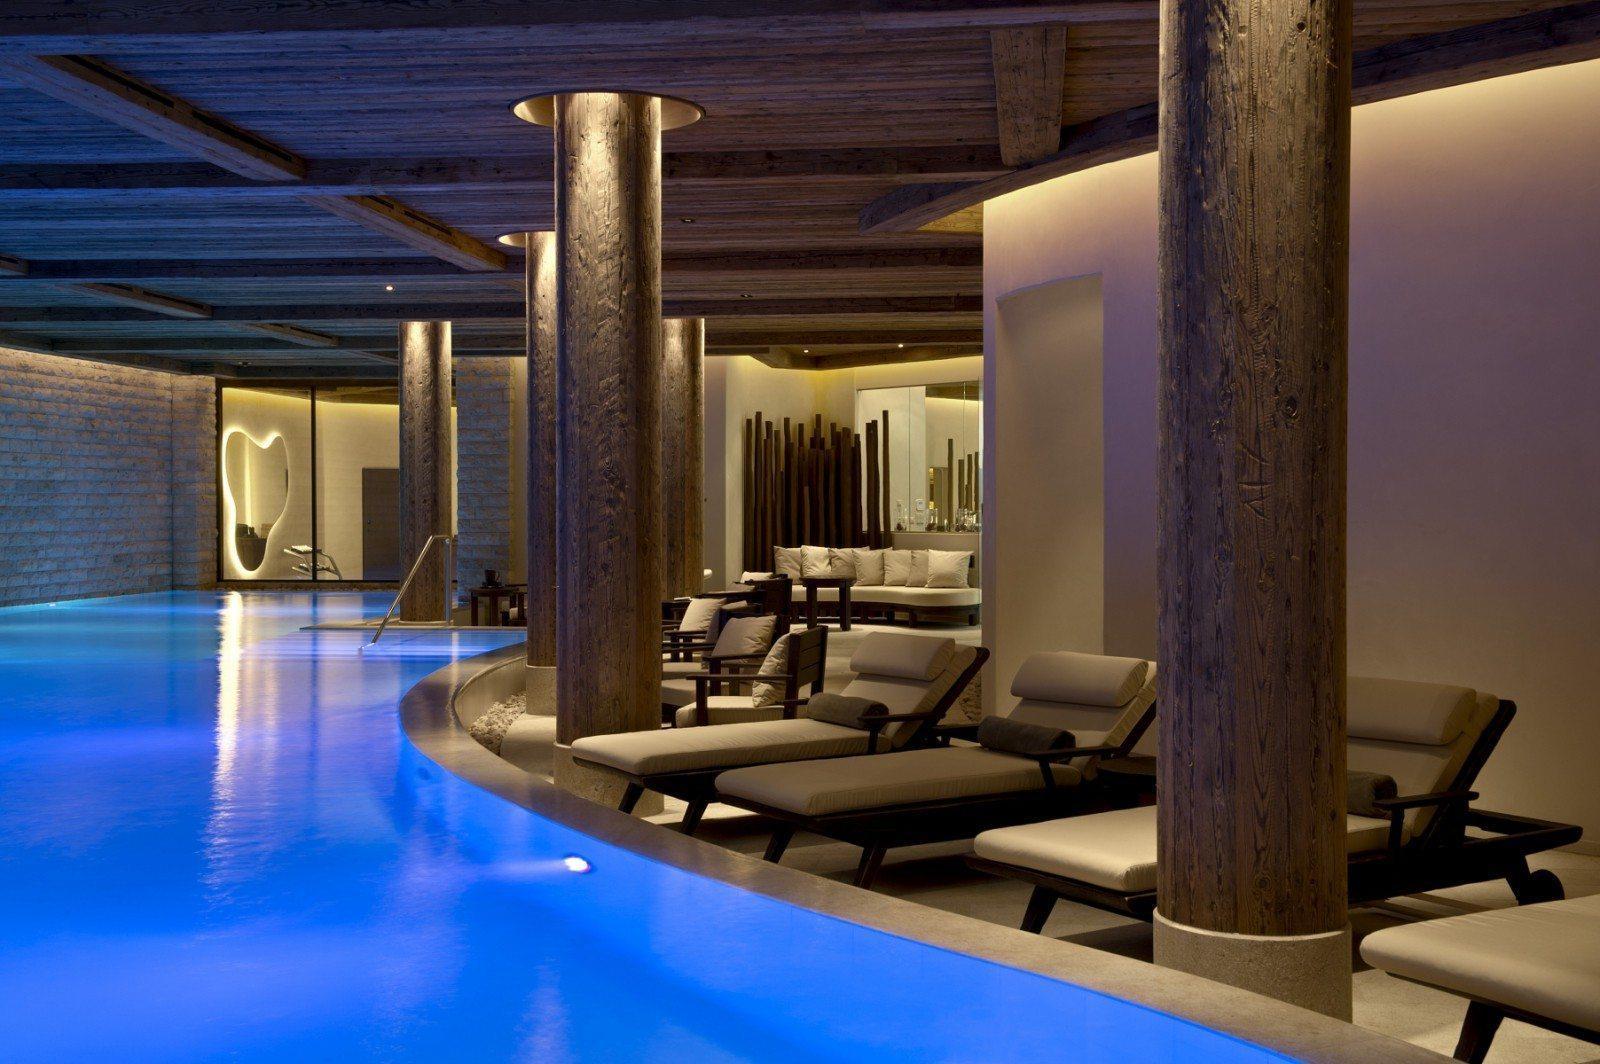 spa-six-senses-yoga-piscine-relaxation-bien-etre-2